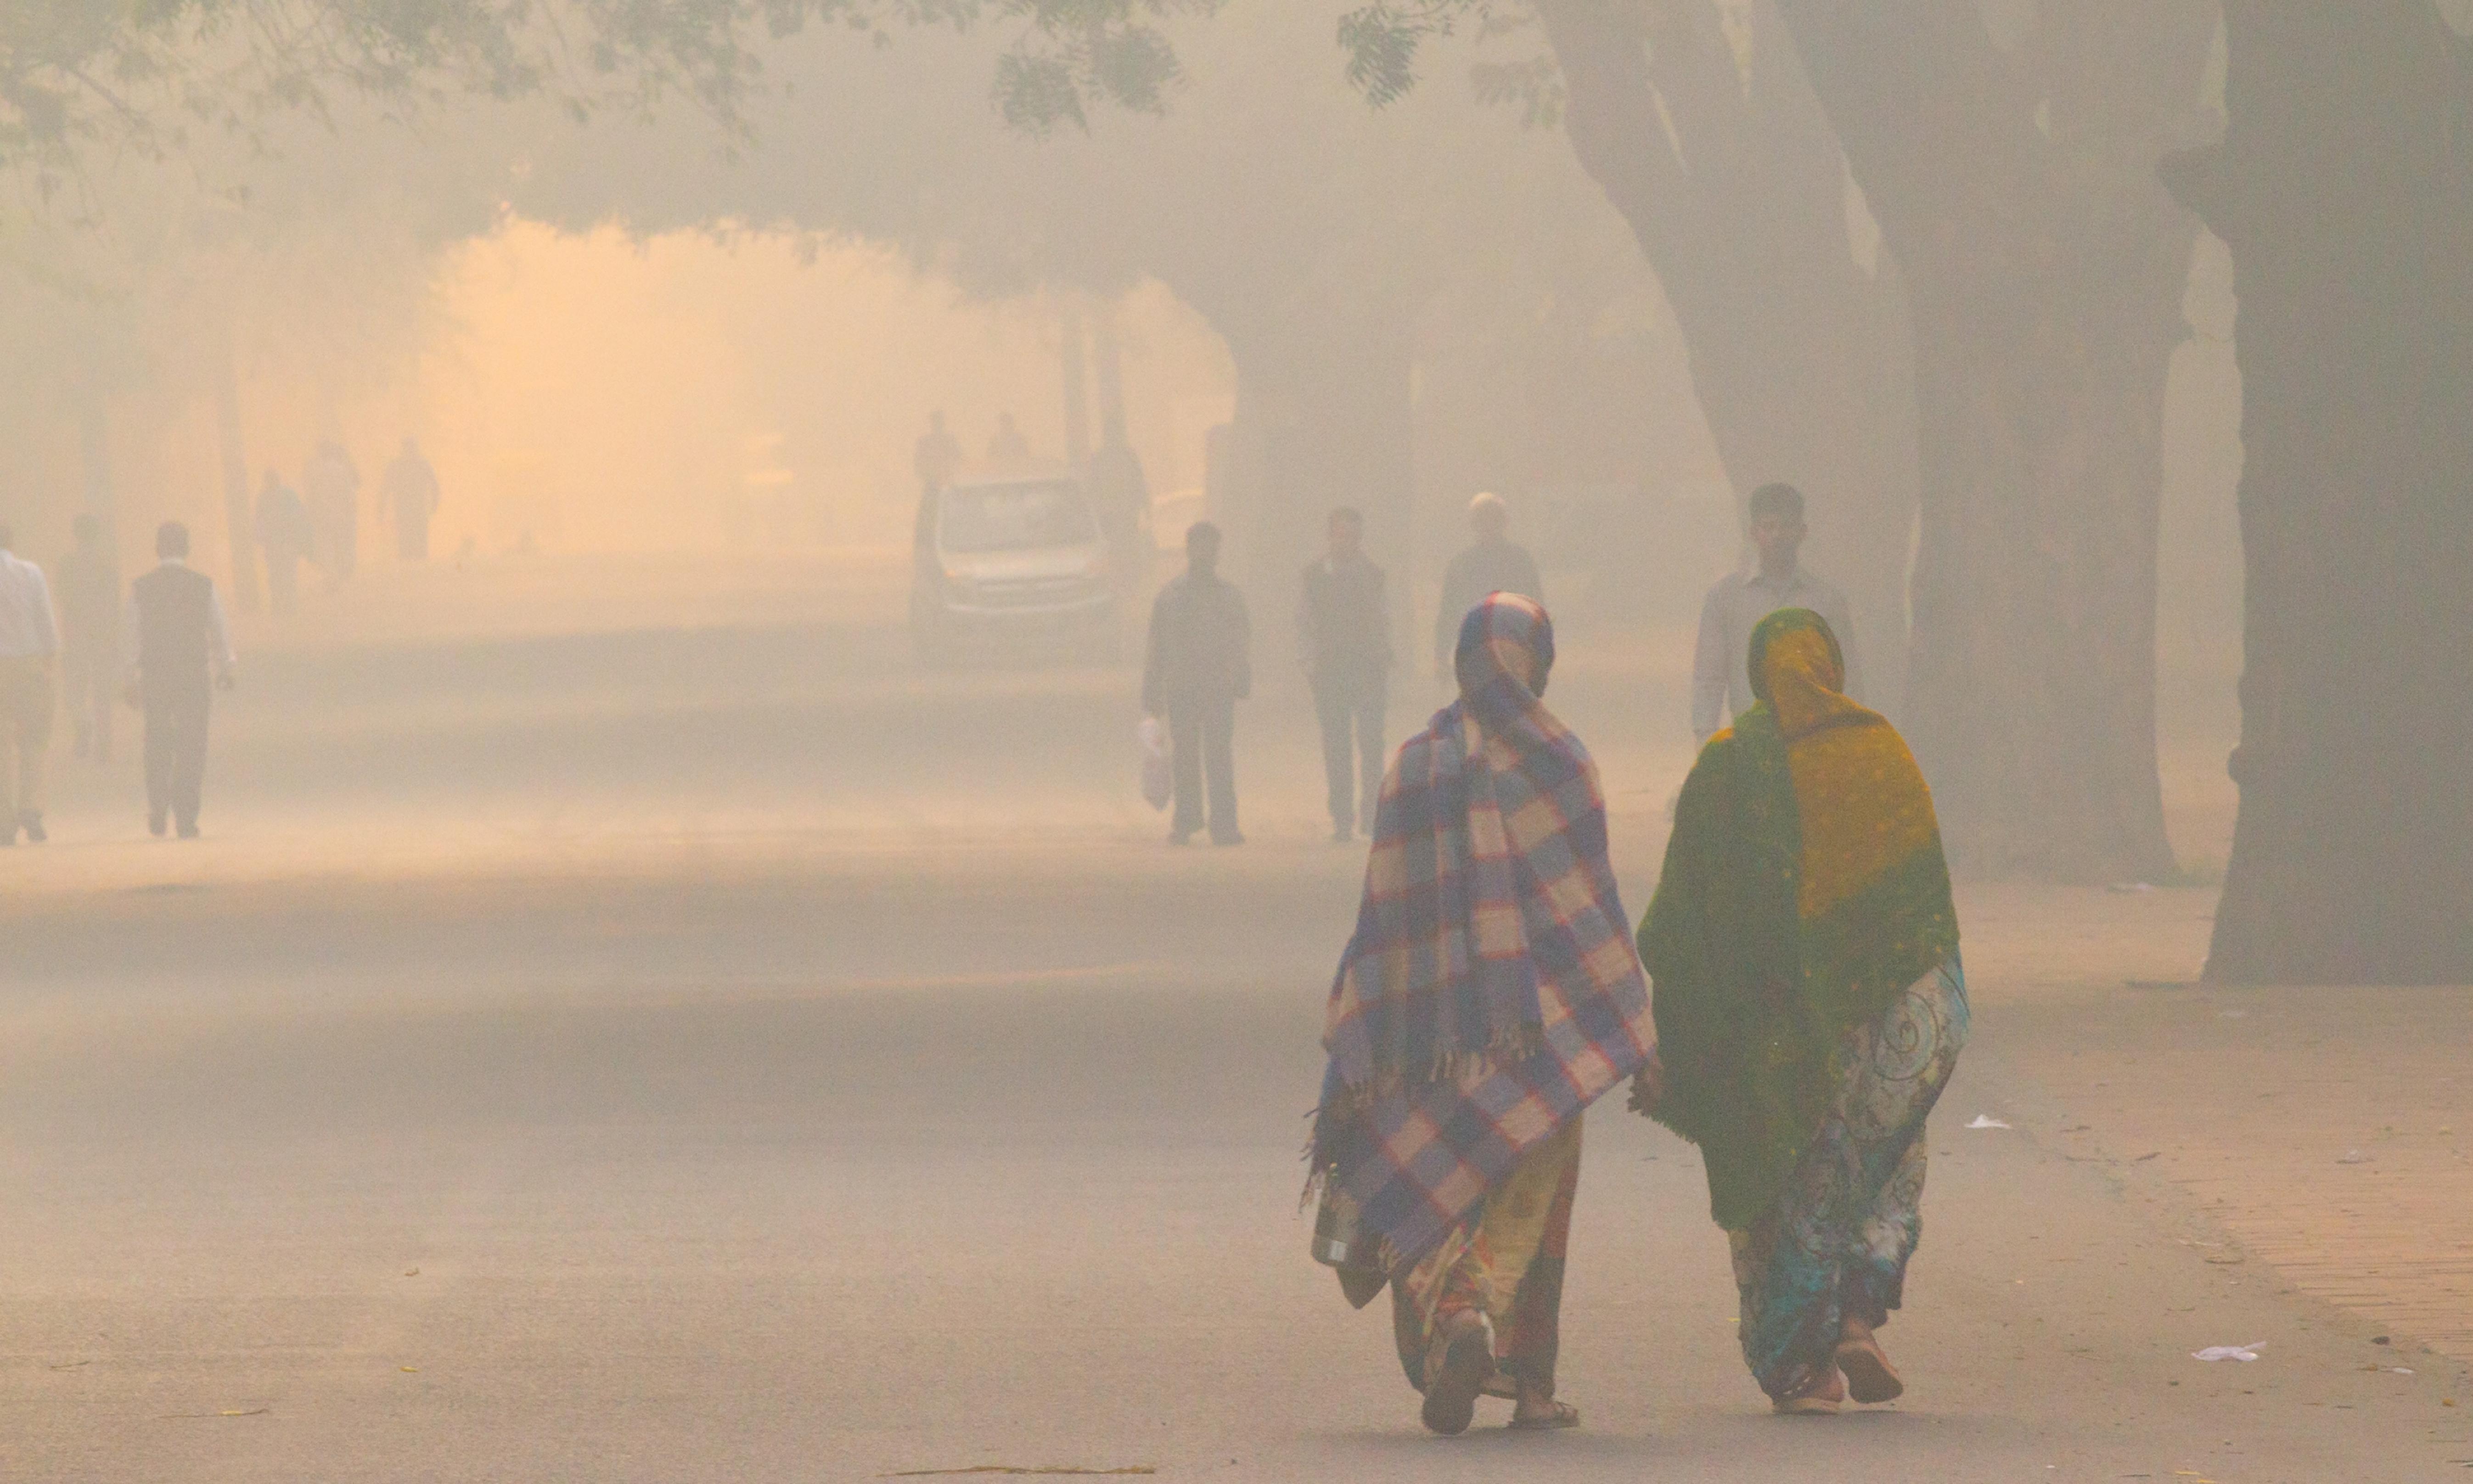 Luften i Indien